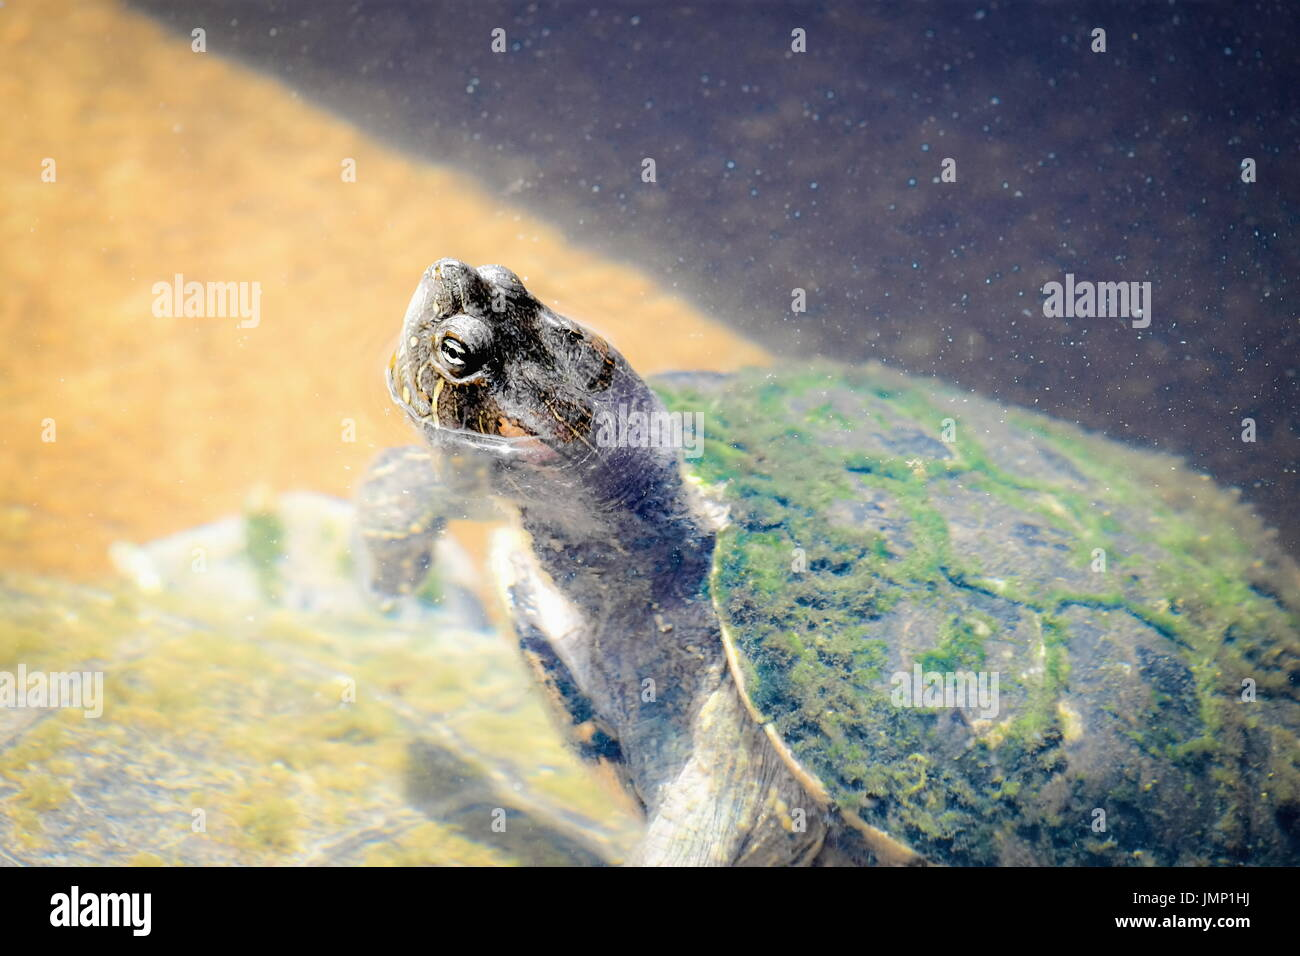 Cerca de una tortuga con su cabeza fuera del agua Imagen De Stock